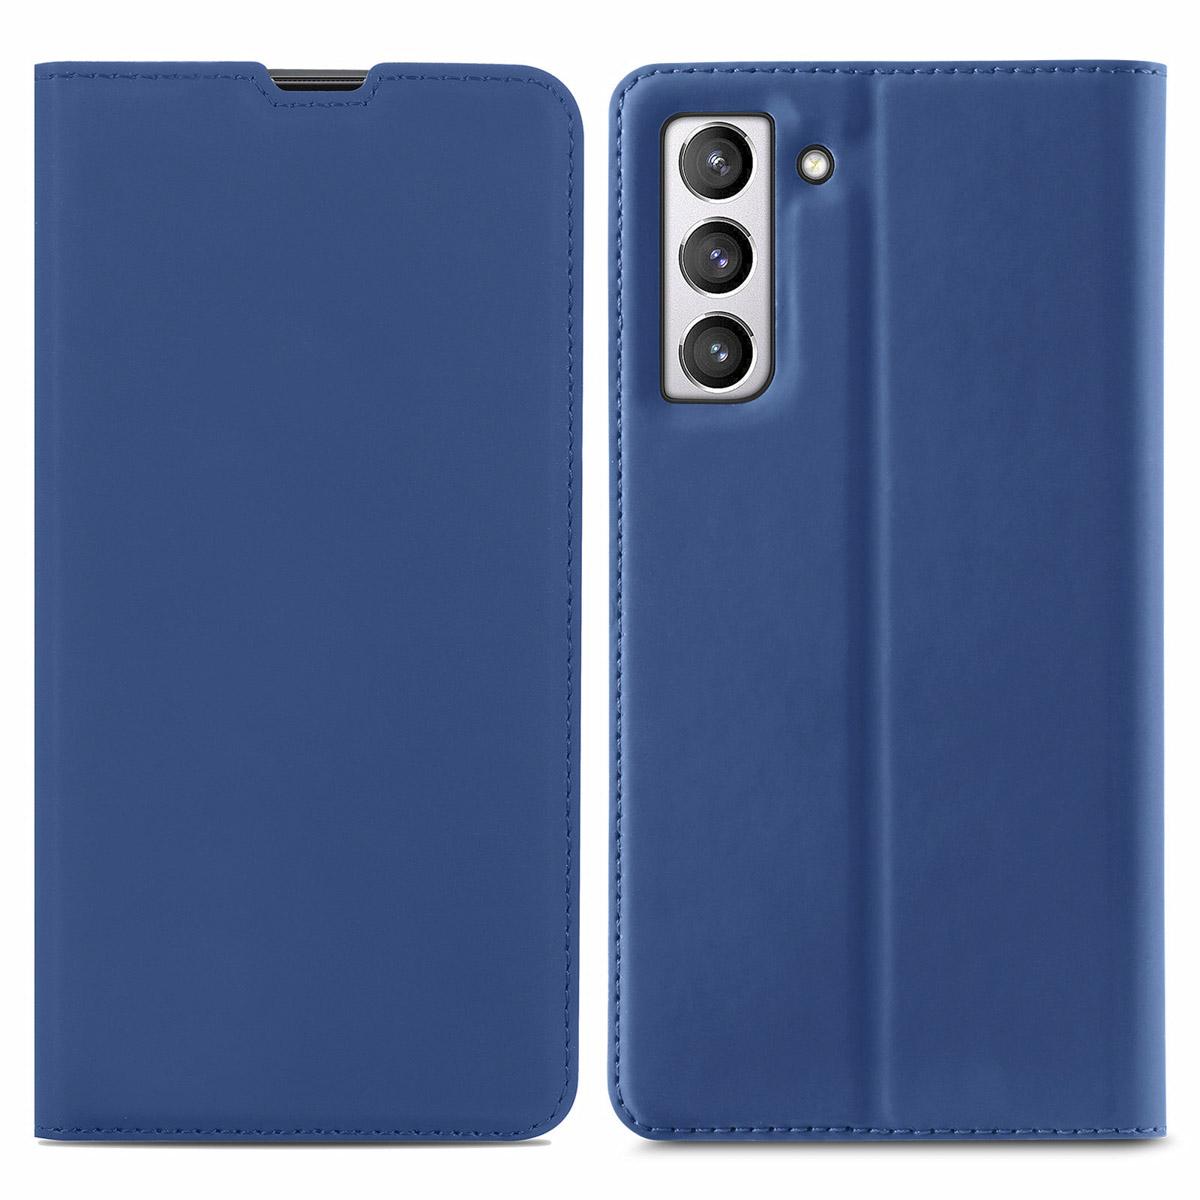 iMoshion Slim Folio Booklet Samsung Galaxy S21 FE - Blau